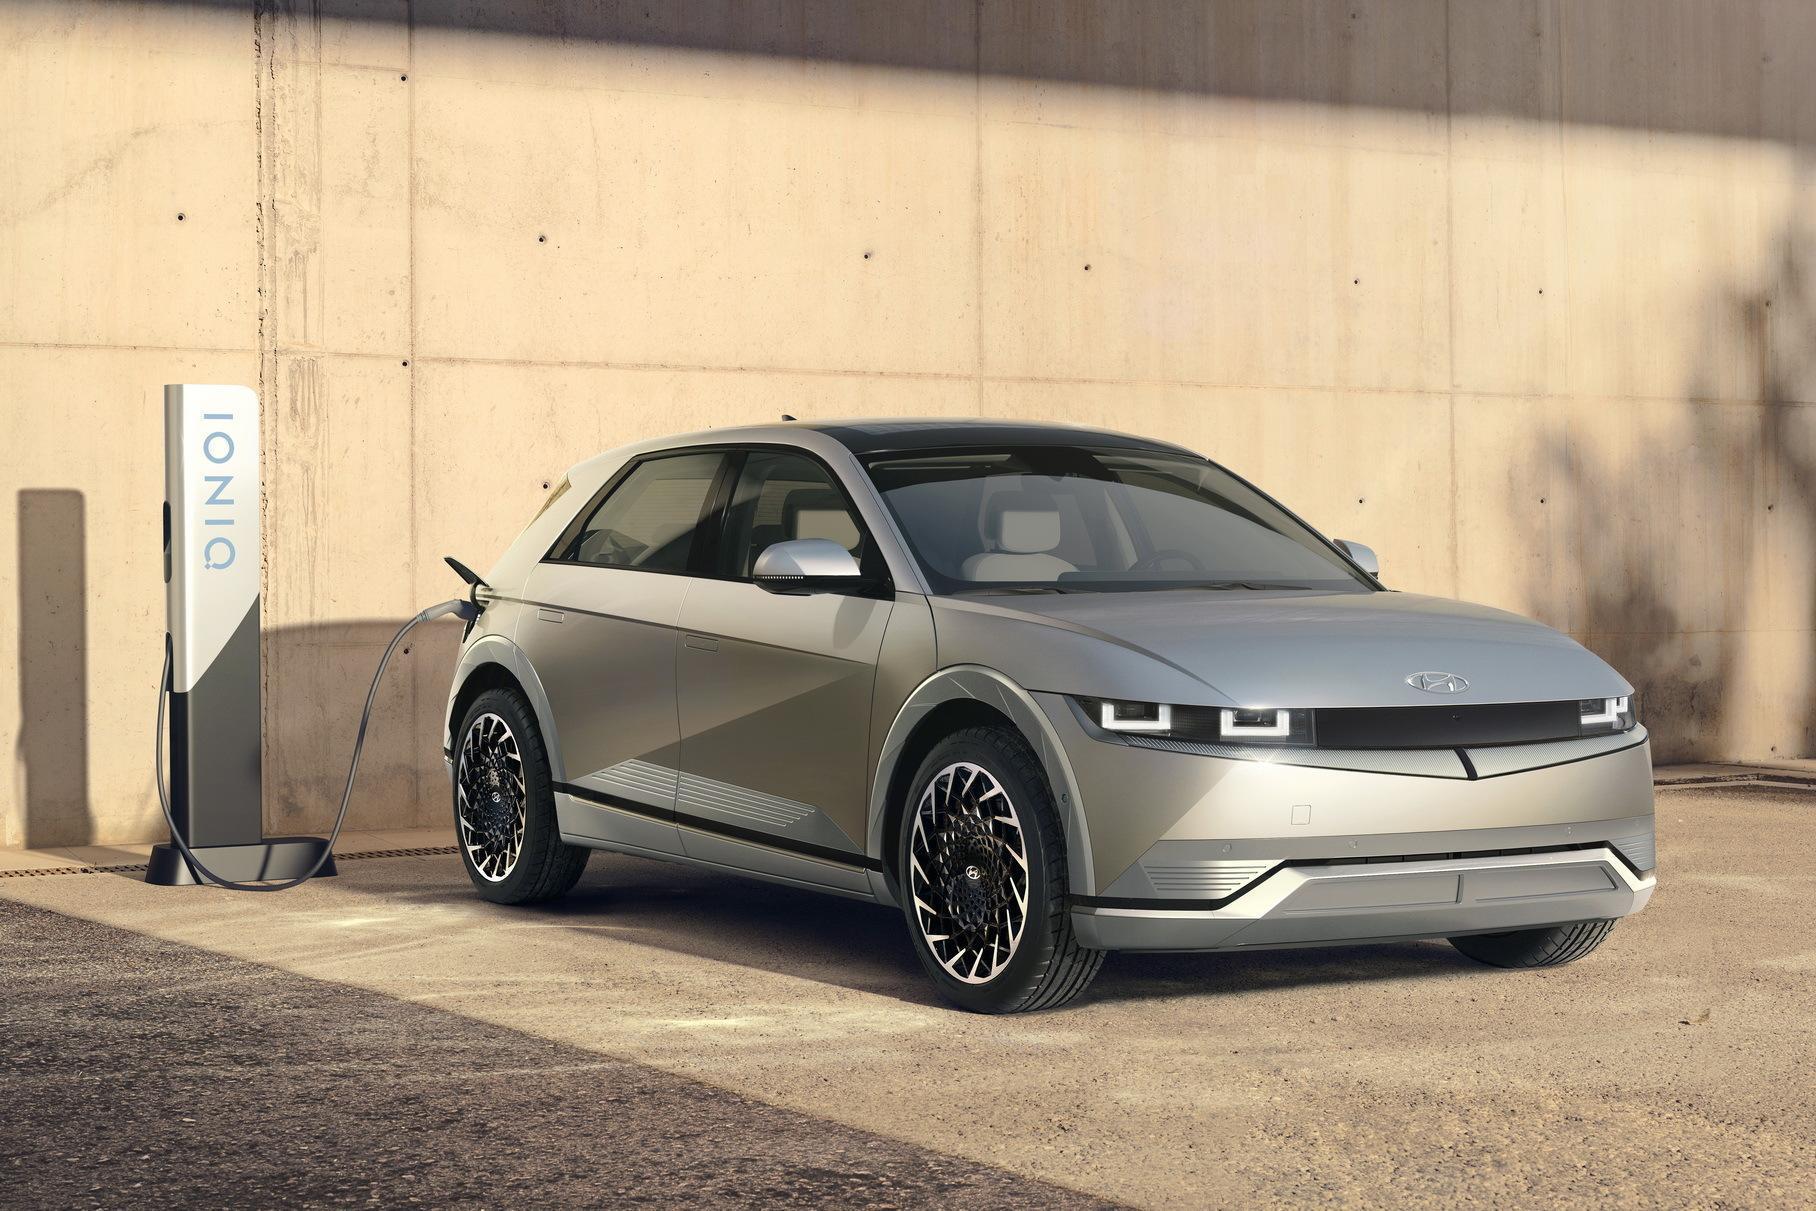 Hyundai представила электромобиль с солнечной батареей на крыше